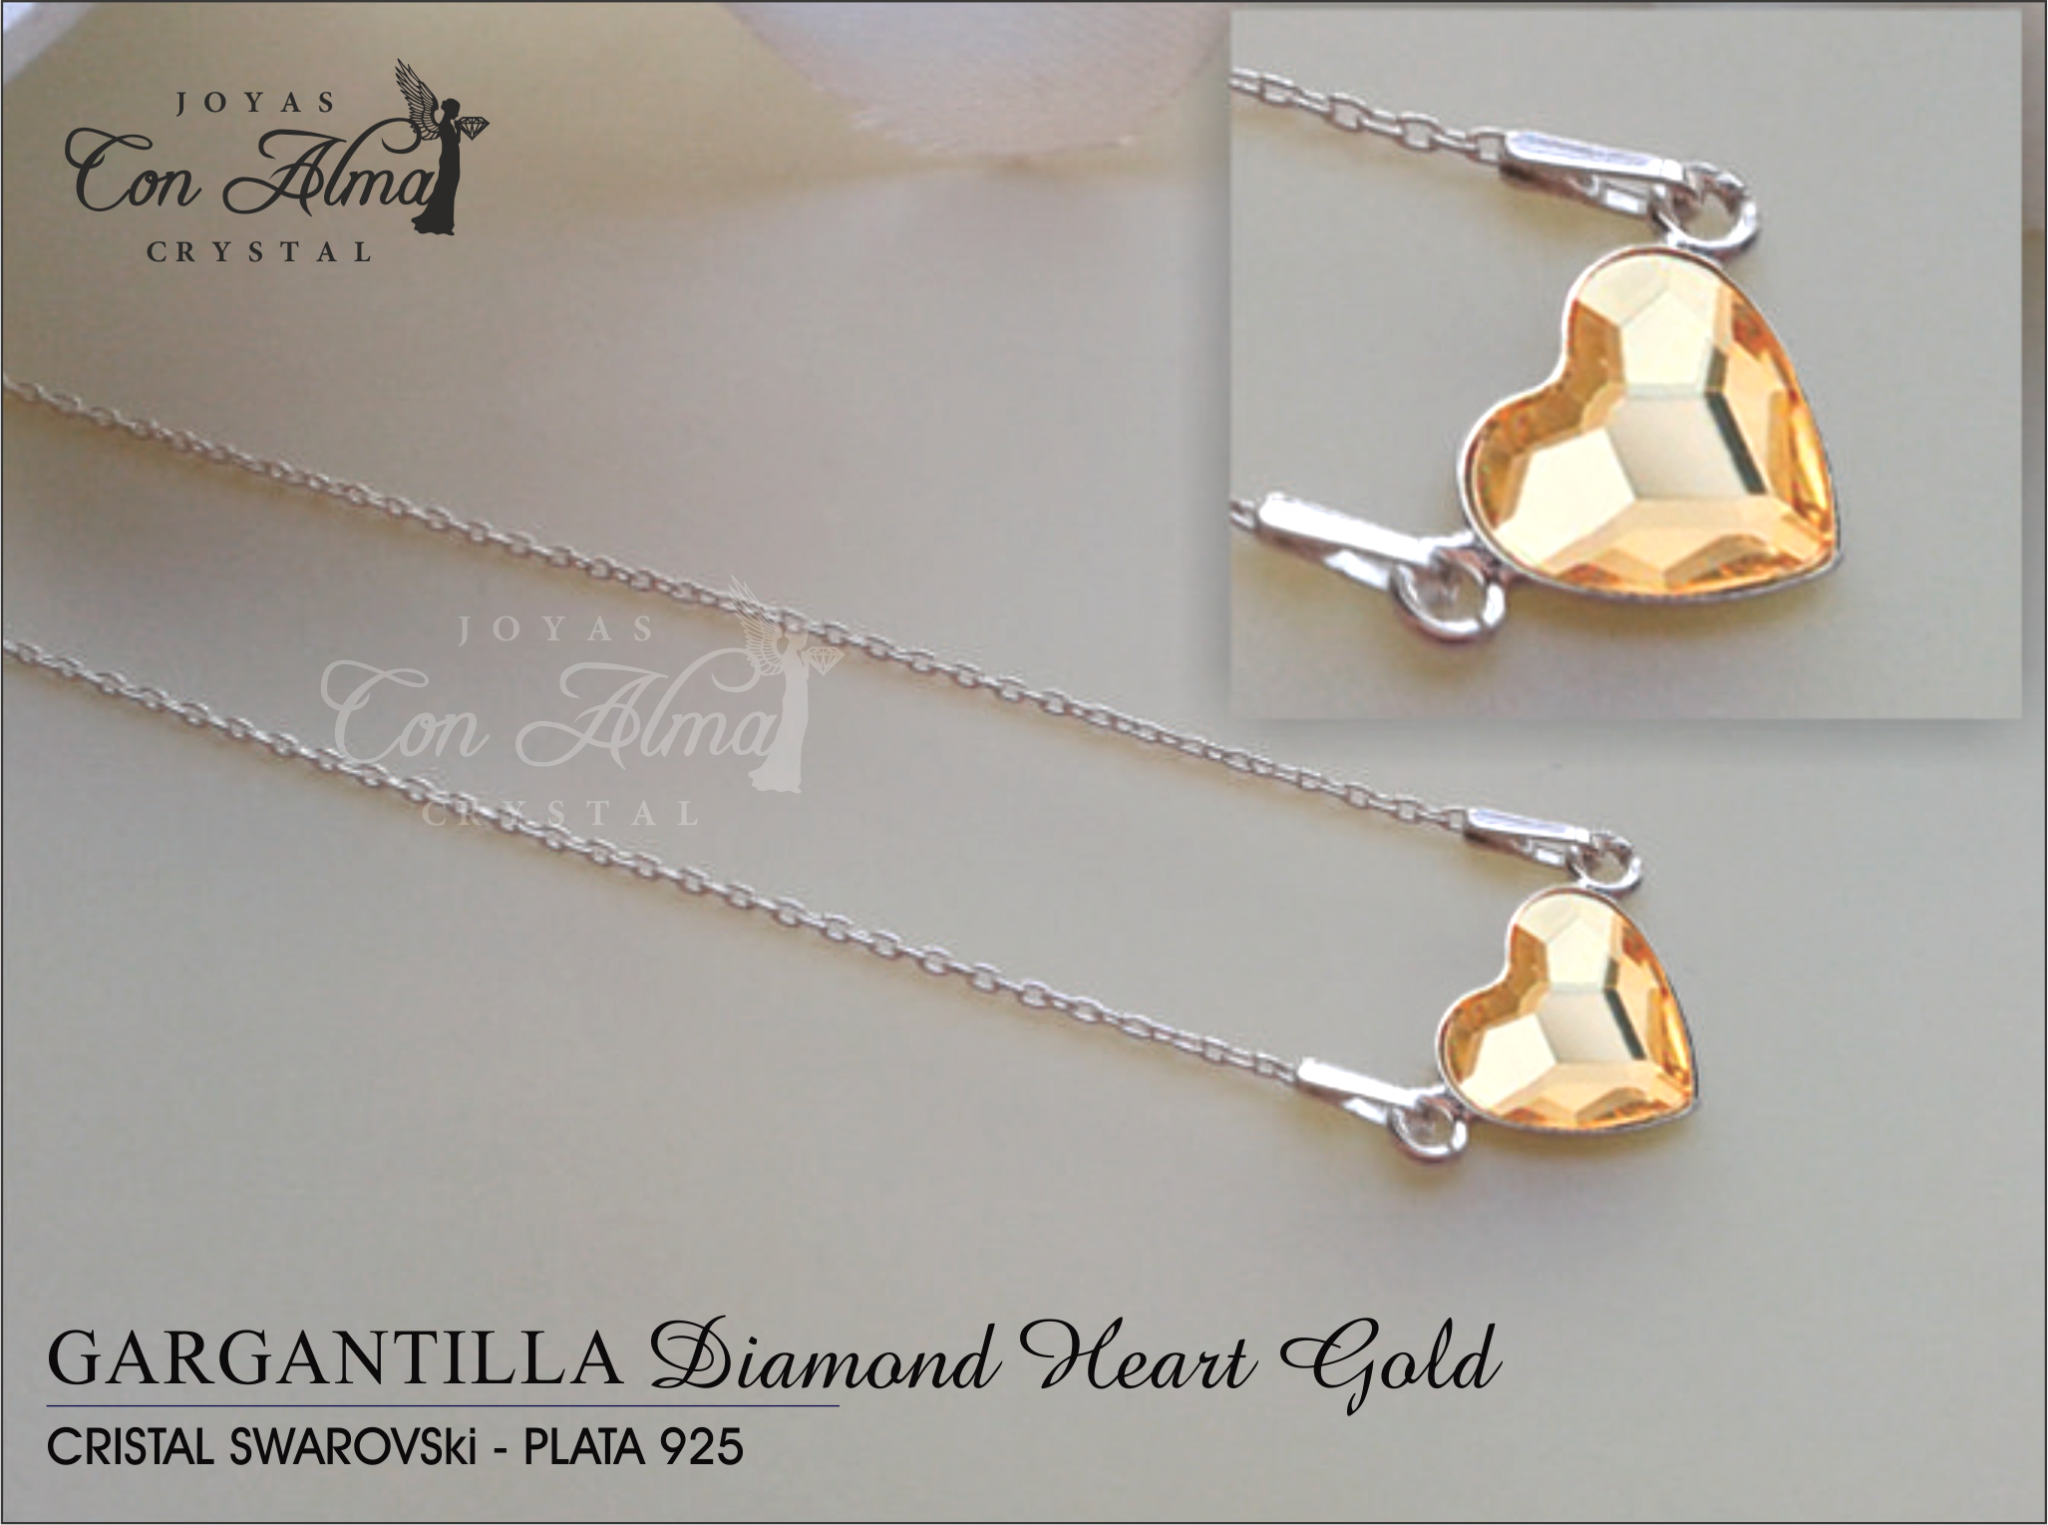 Gargantilla Diamond Gold  34,99 €